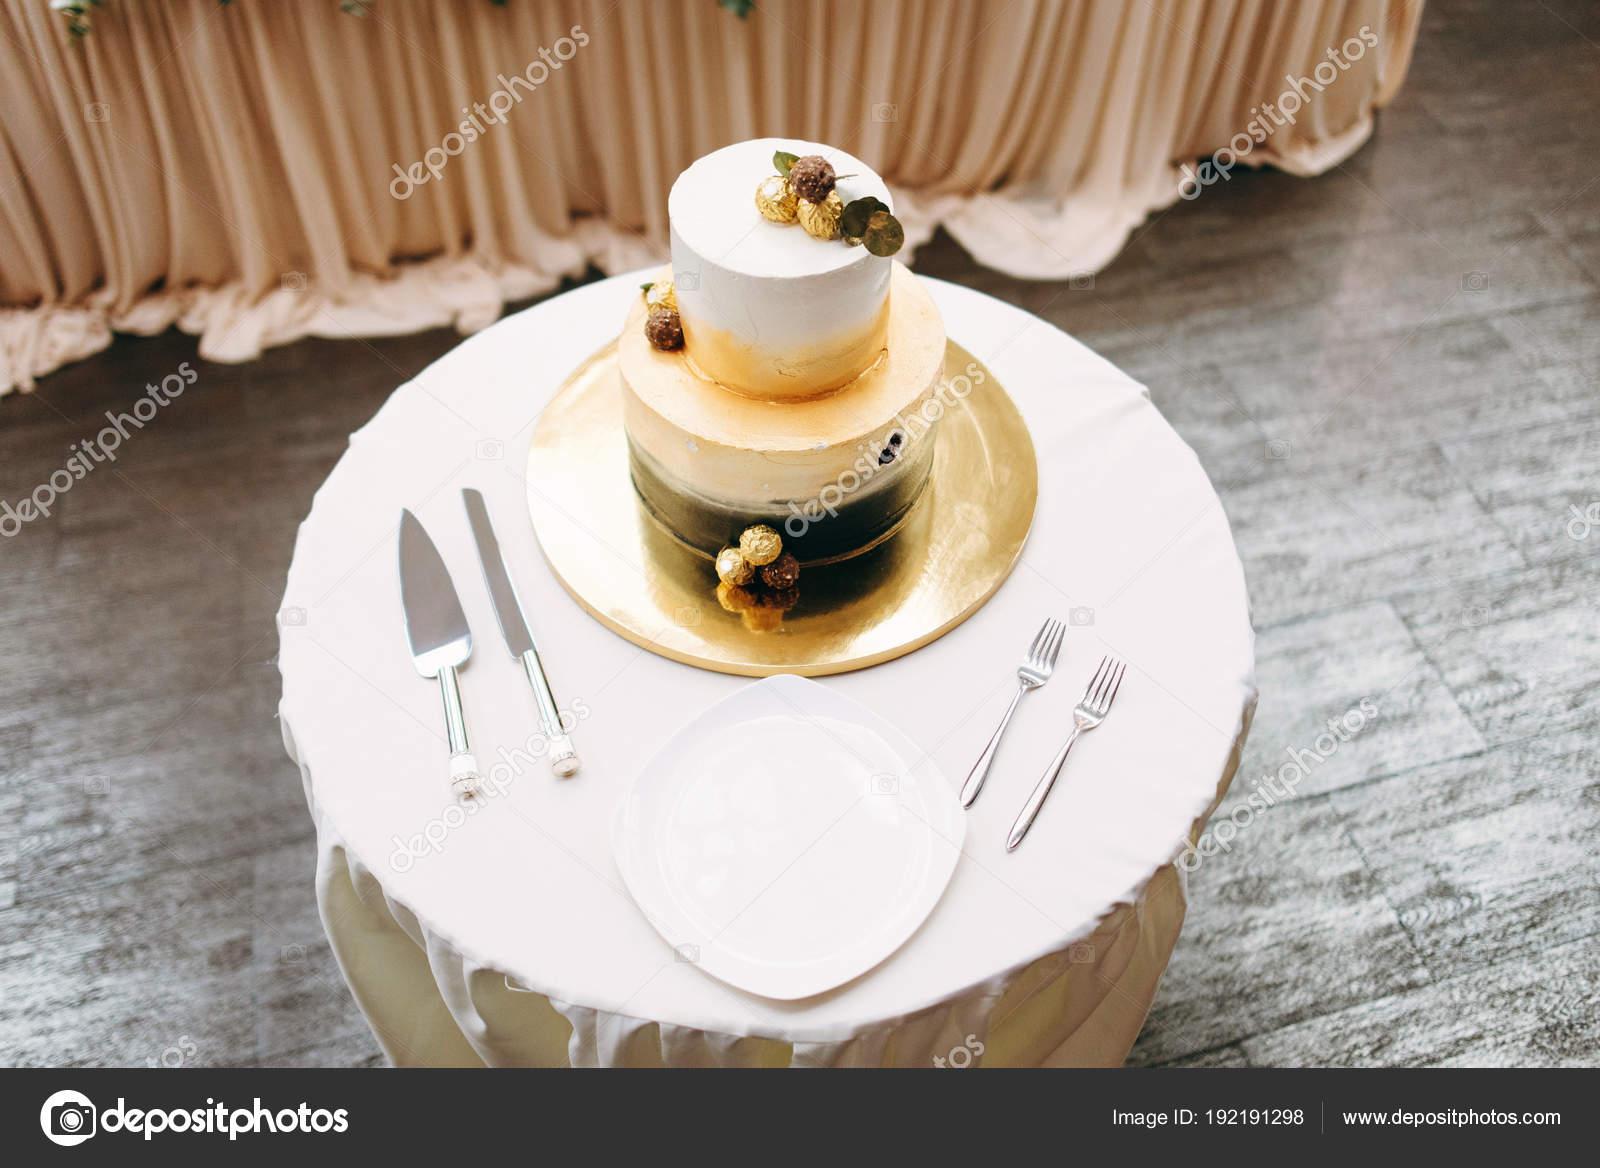 Wedding Cake Served Golden Cake Stand White Plate Forks Knife ...